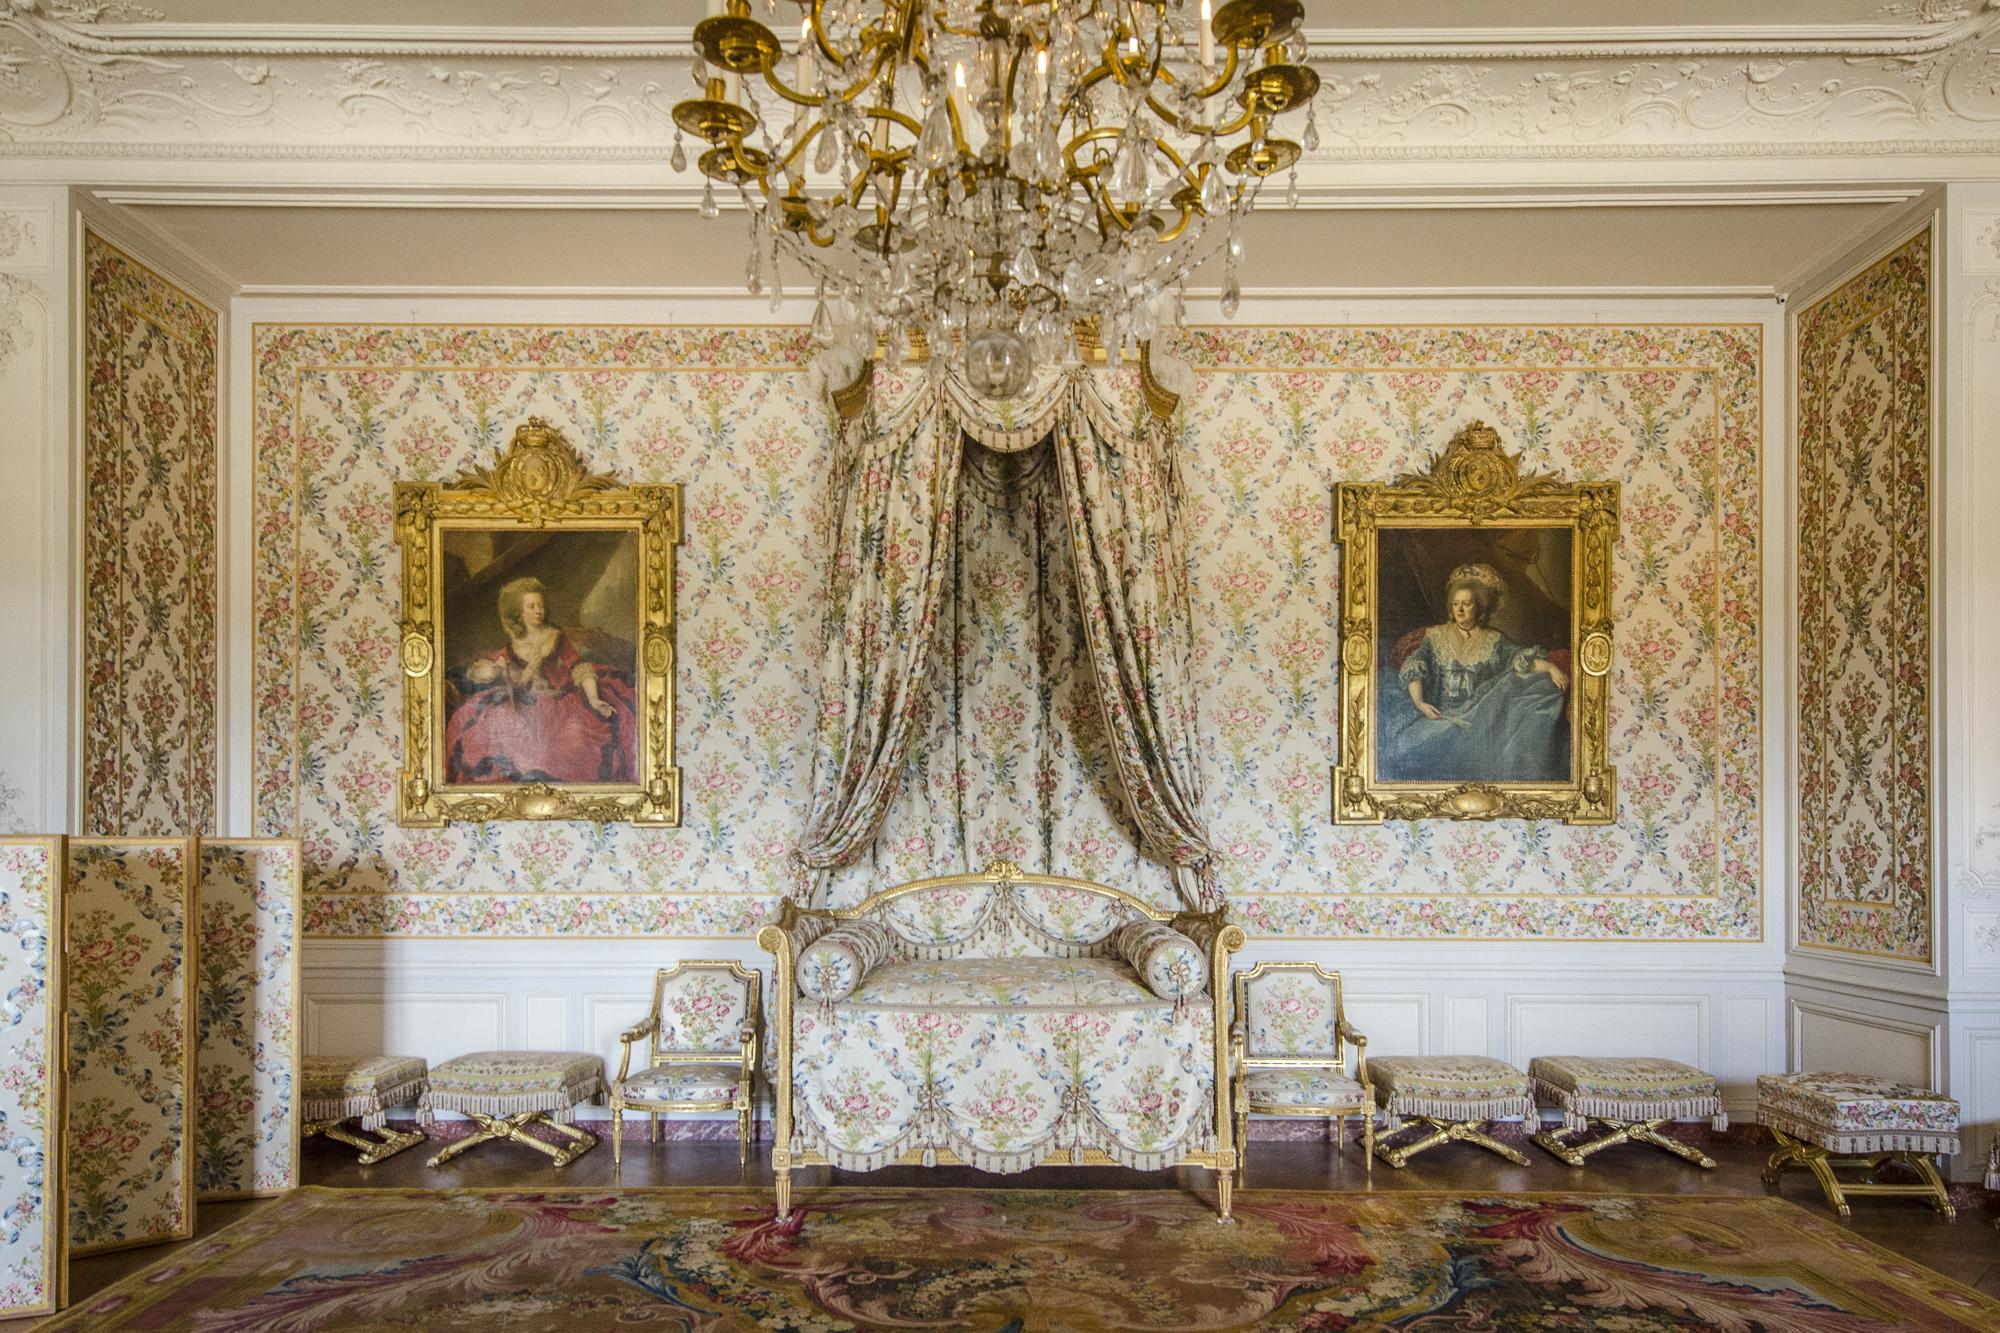 Chambre de Madame Adélaïde  PHOTOGRAPHY: ALEXANDER J.E. BRADLEY • NIKON D500 • AF-S NIKKOR 24-70mm f/2.8G ED @ 24mm • Ƒ/6.3 • 1/30• ISO 1600